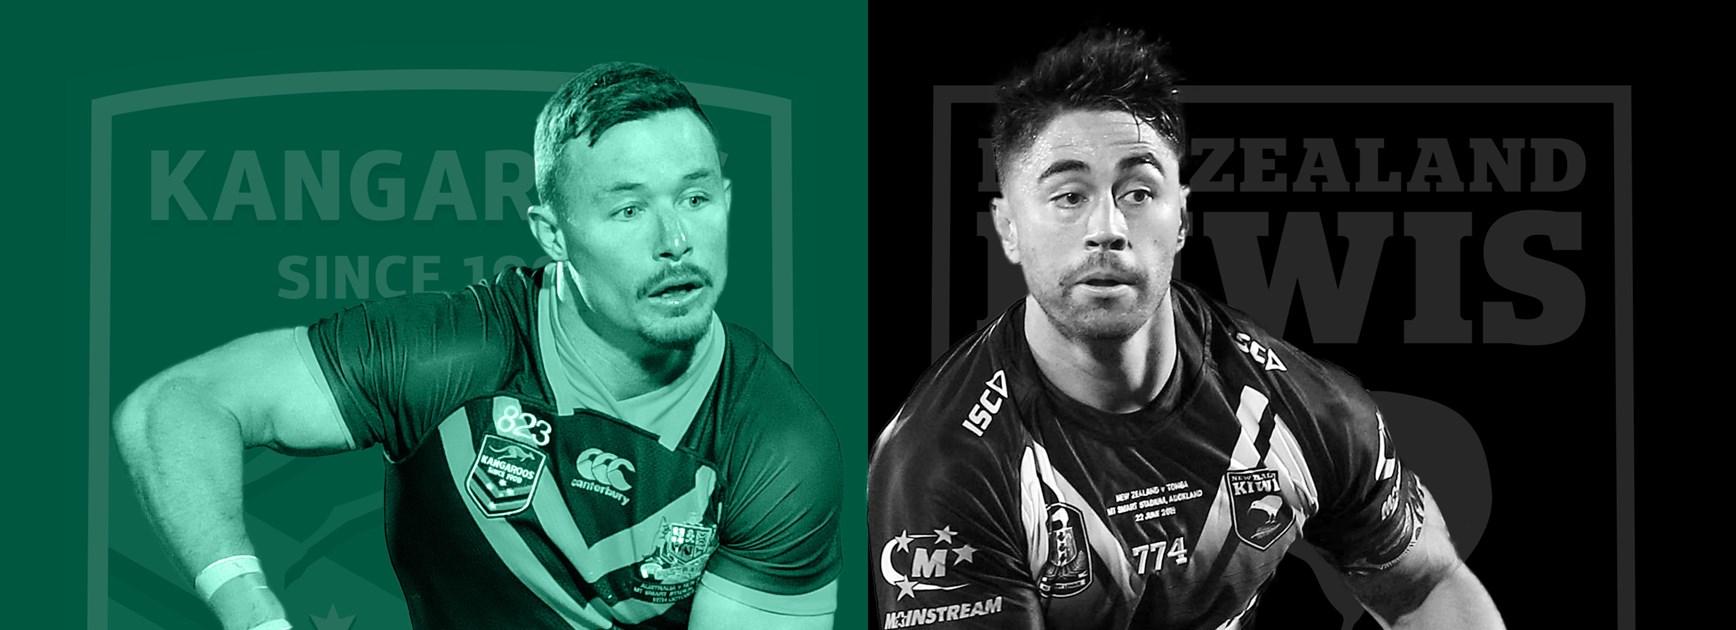 Kangaroos v Kiwis: Trans-Tasman rivalry reignites